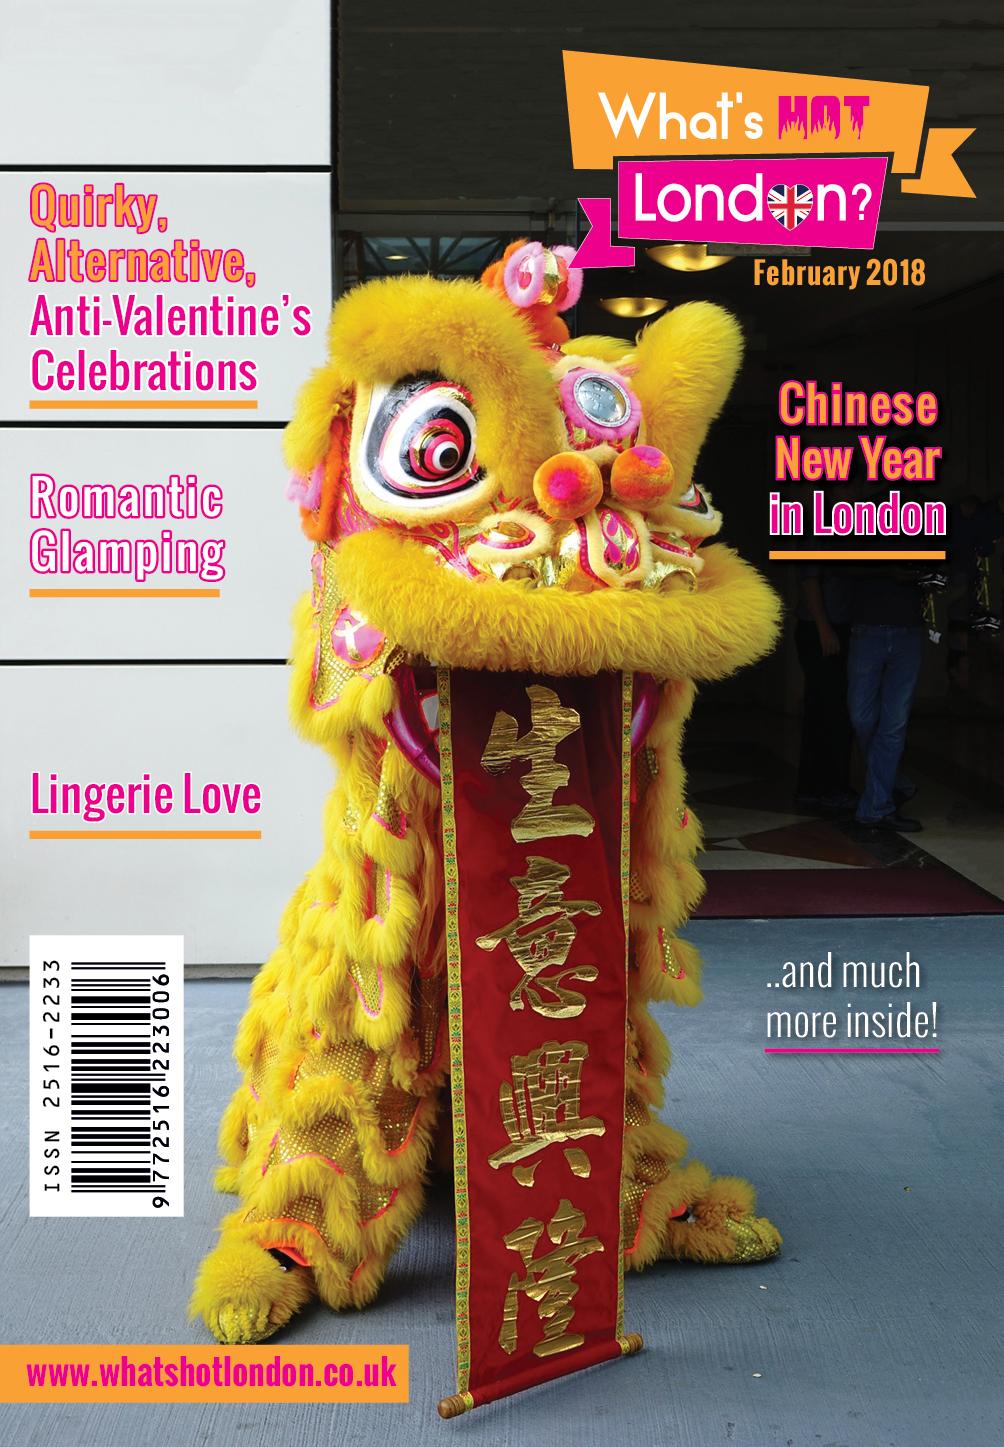 What's Hot London? Magazine February 2018